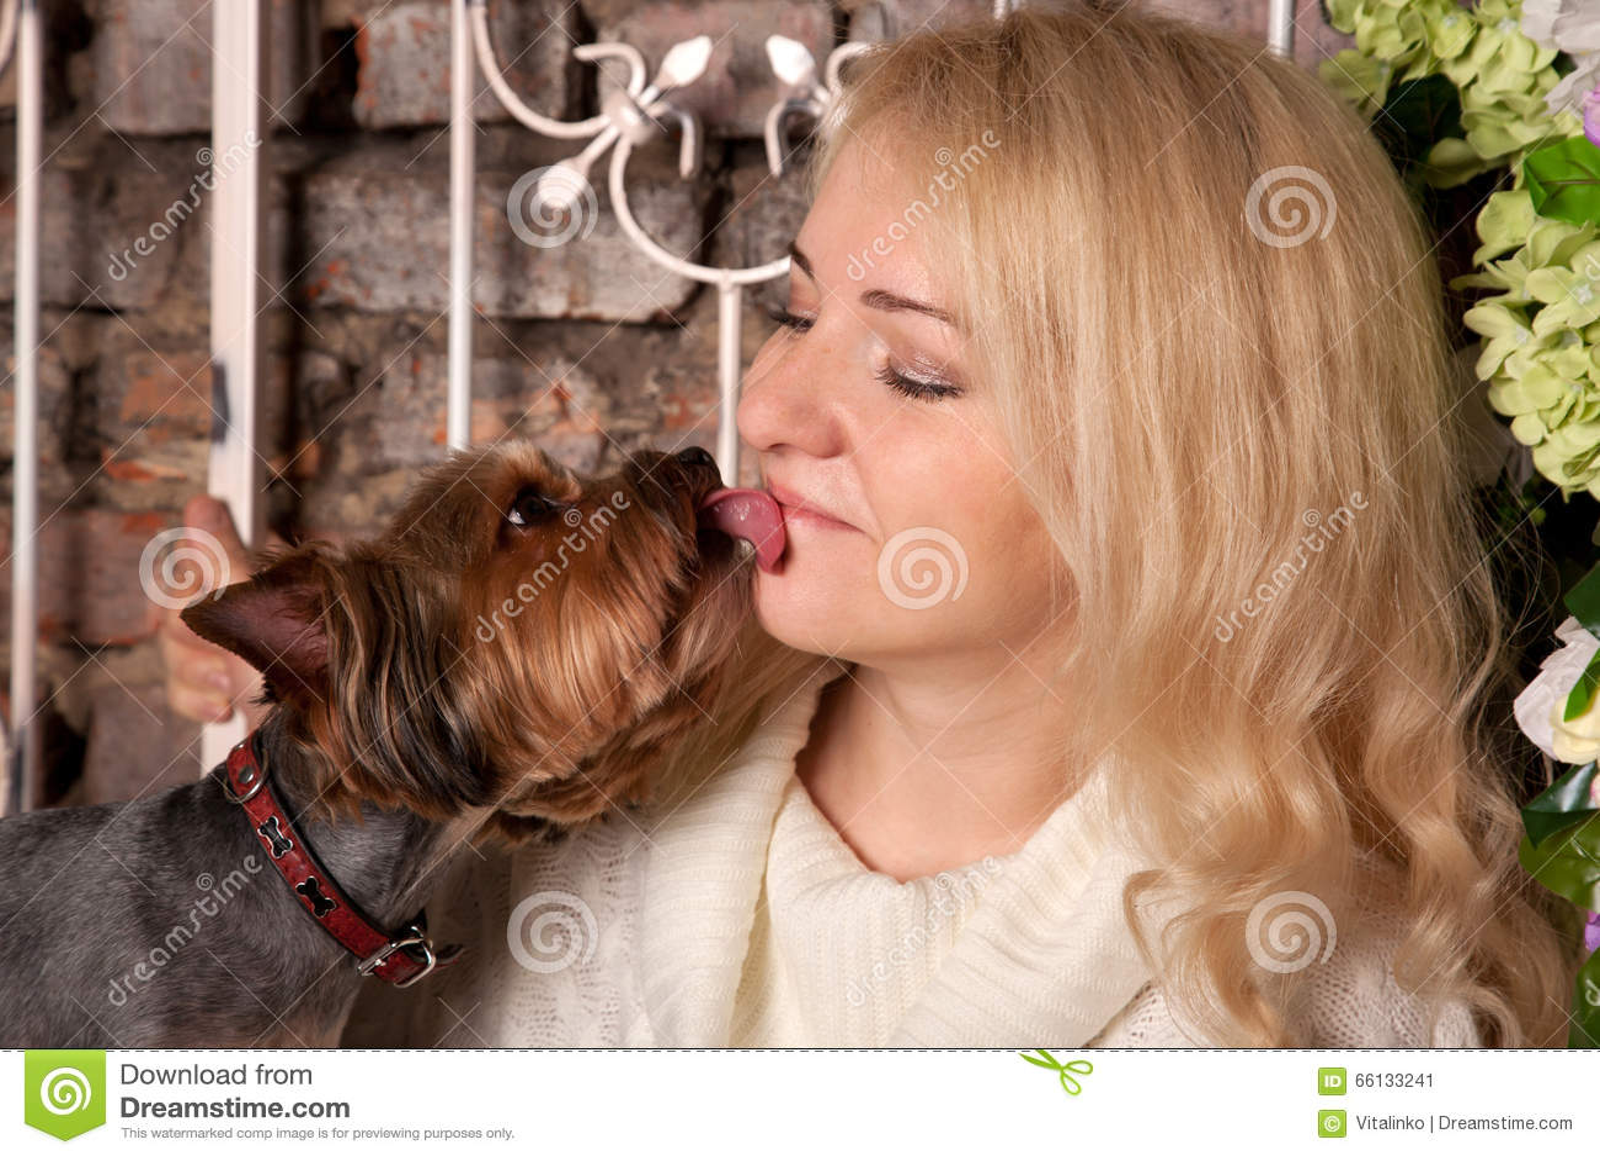 themen bericht frau hund